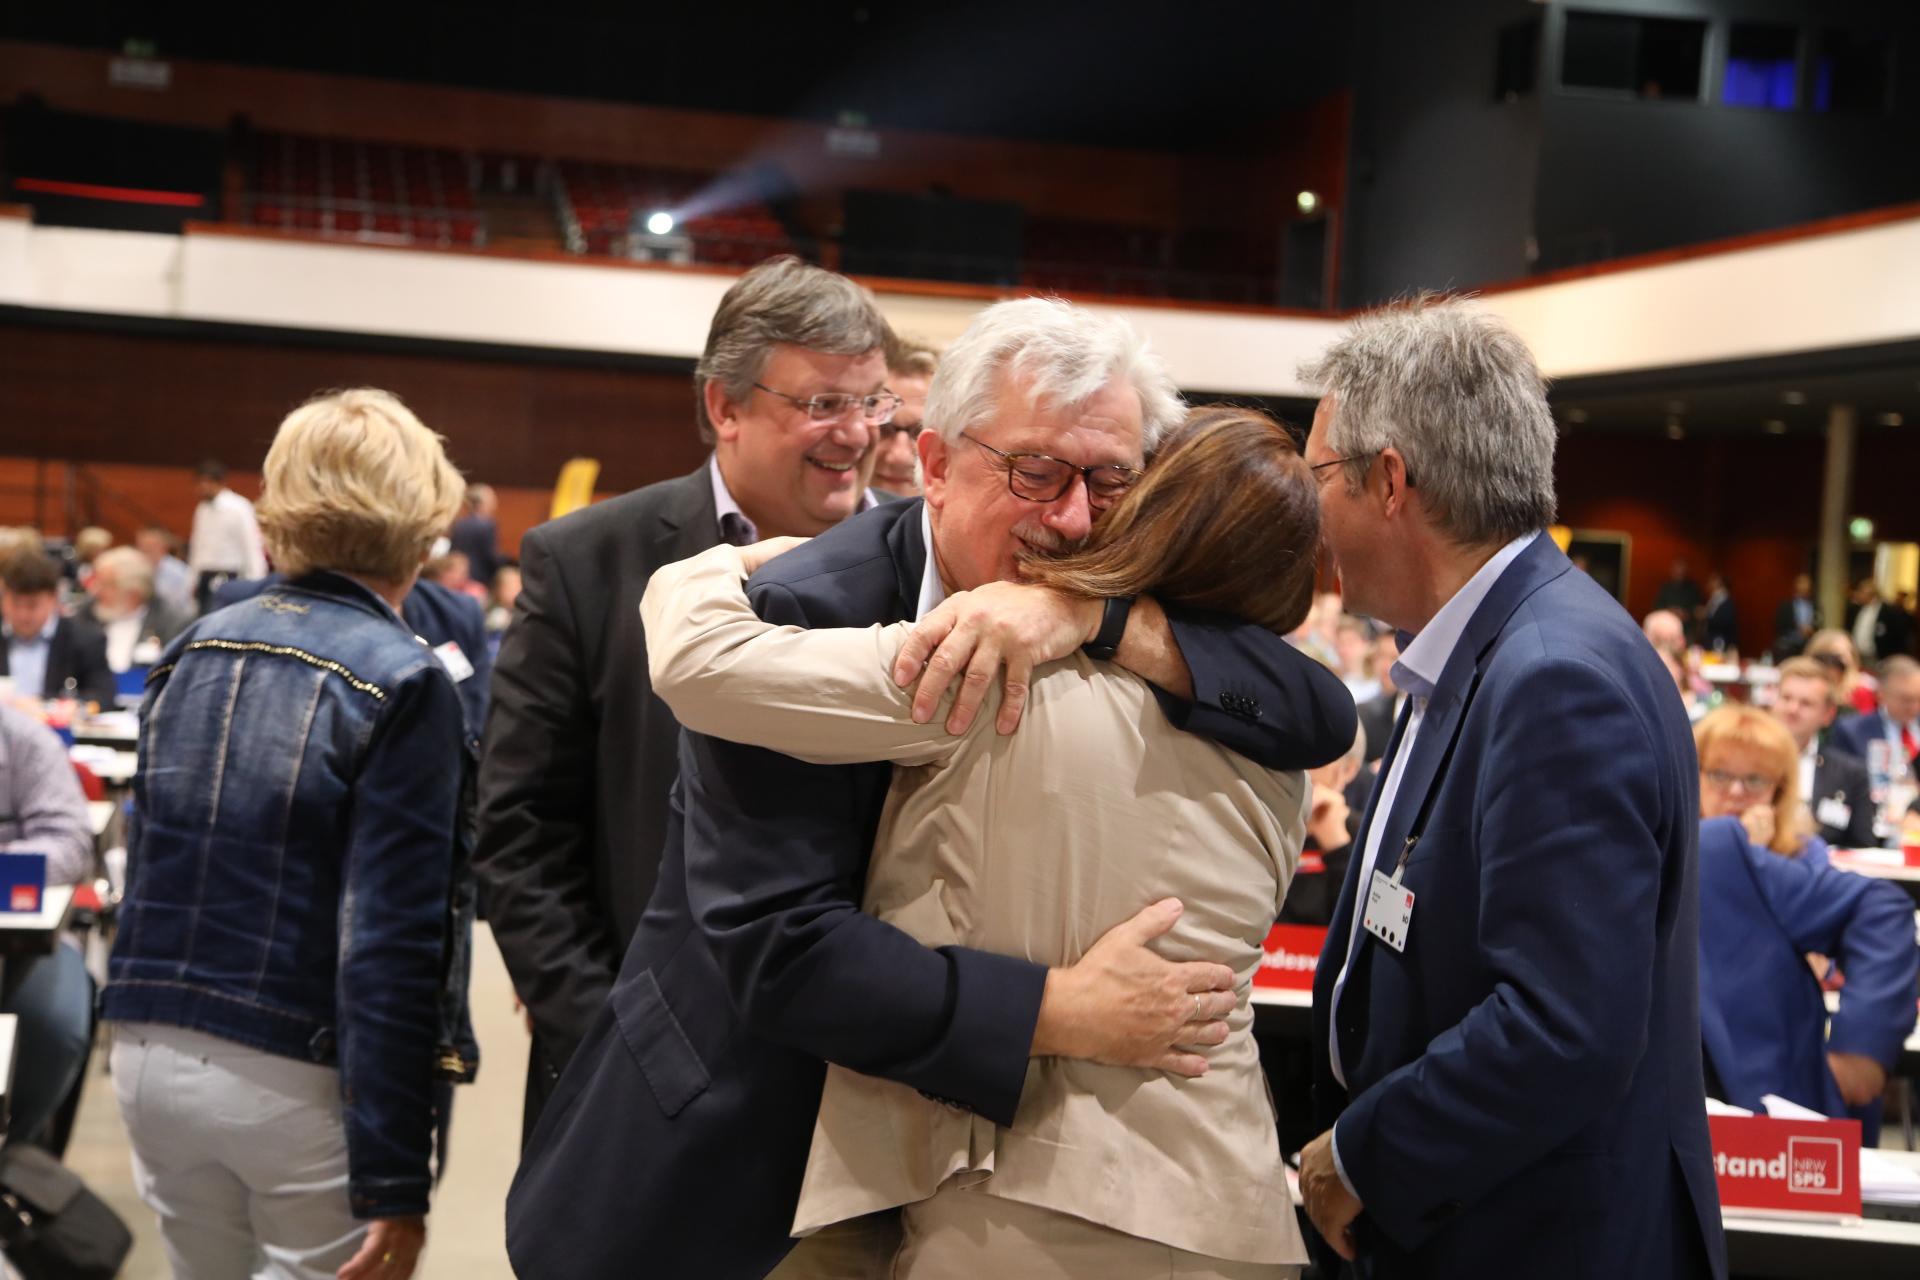 Delegierte umarmen sich